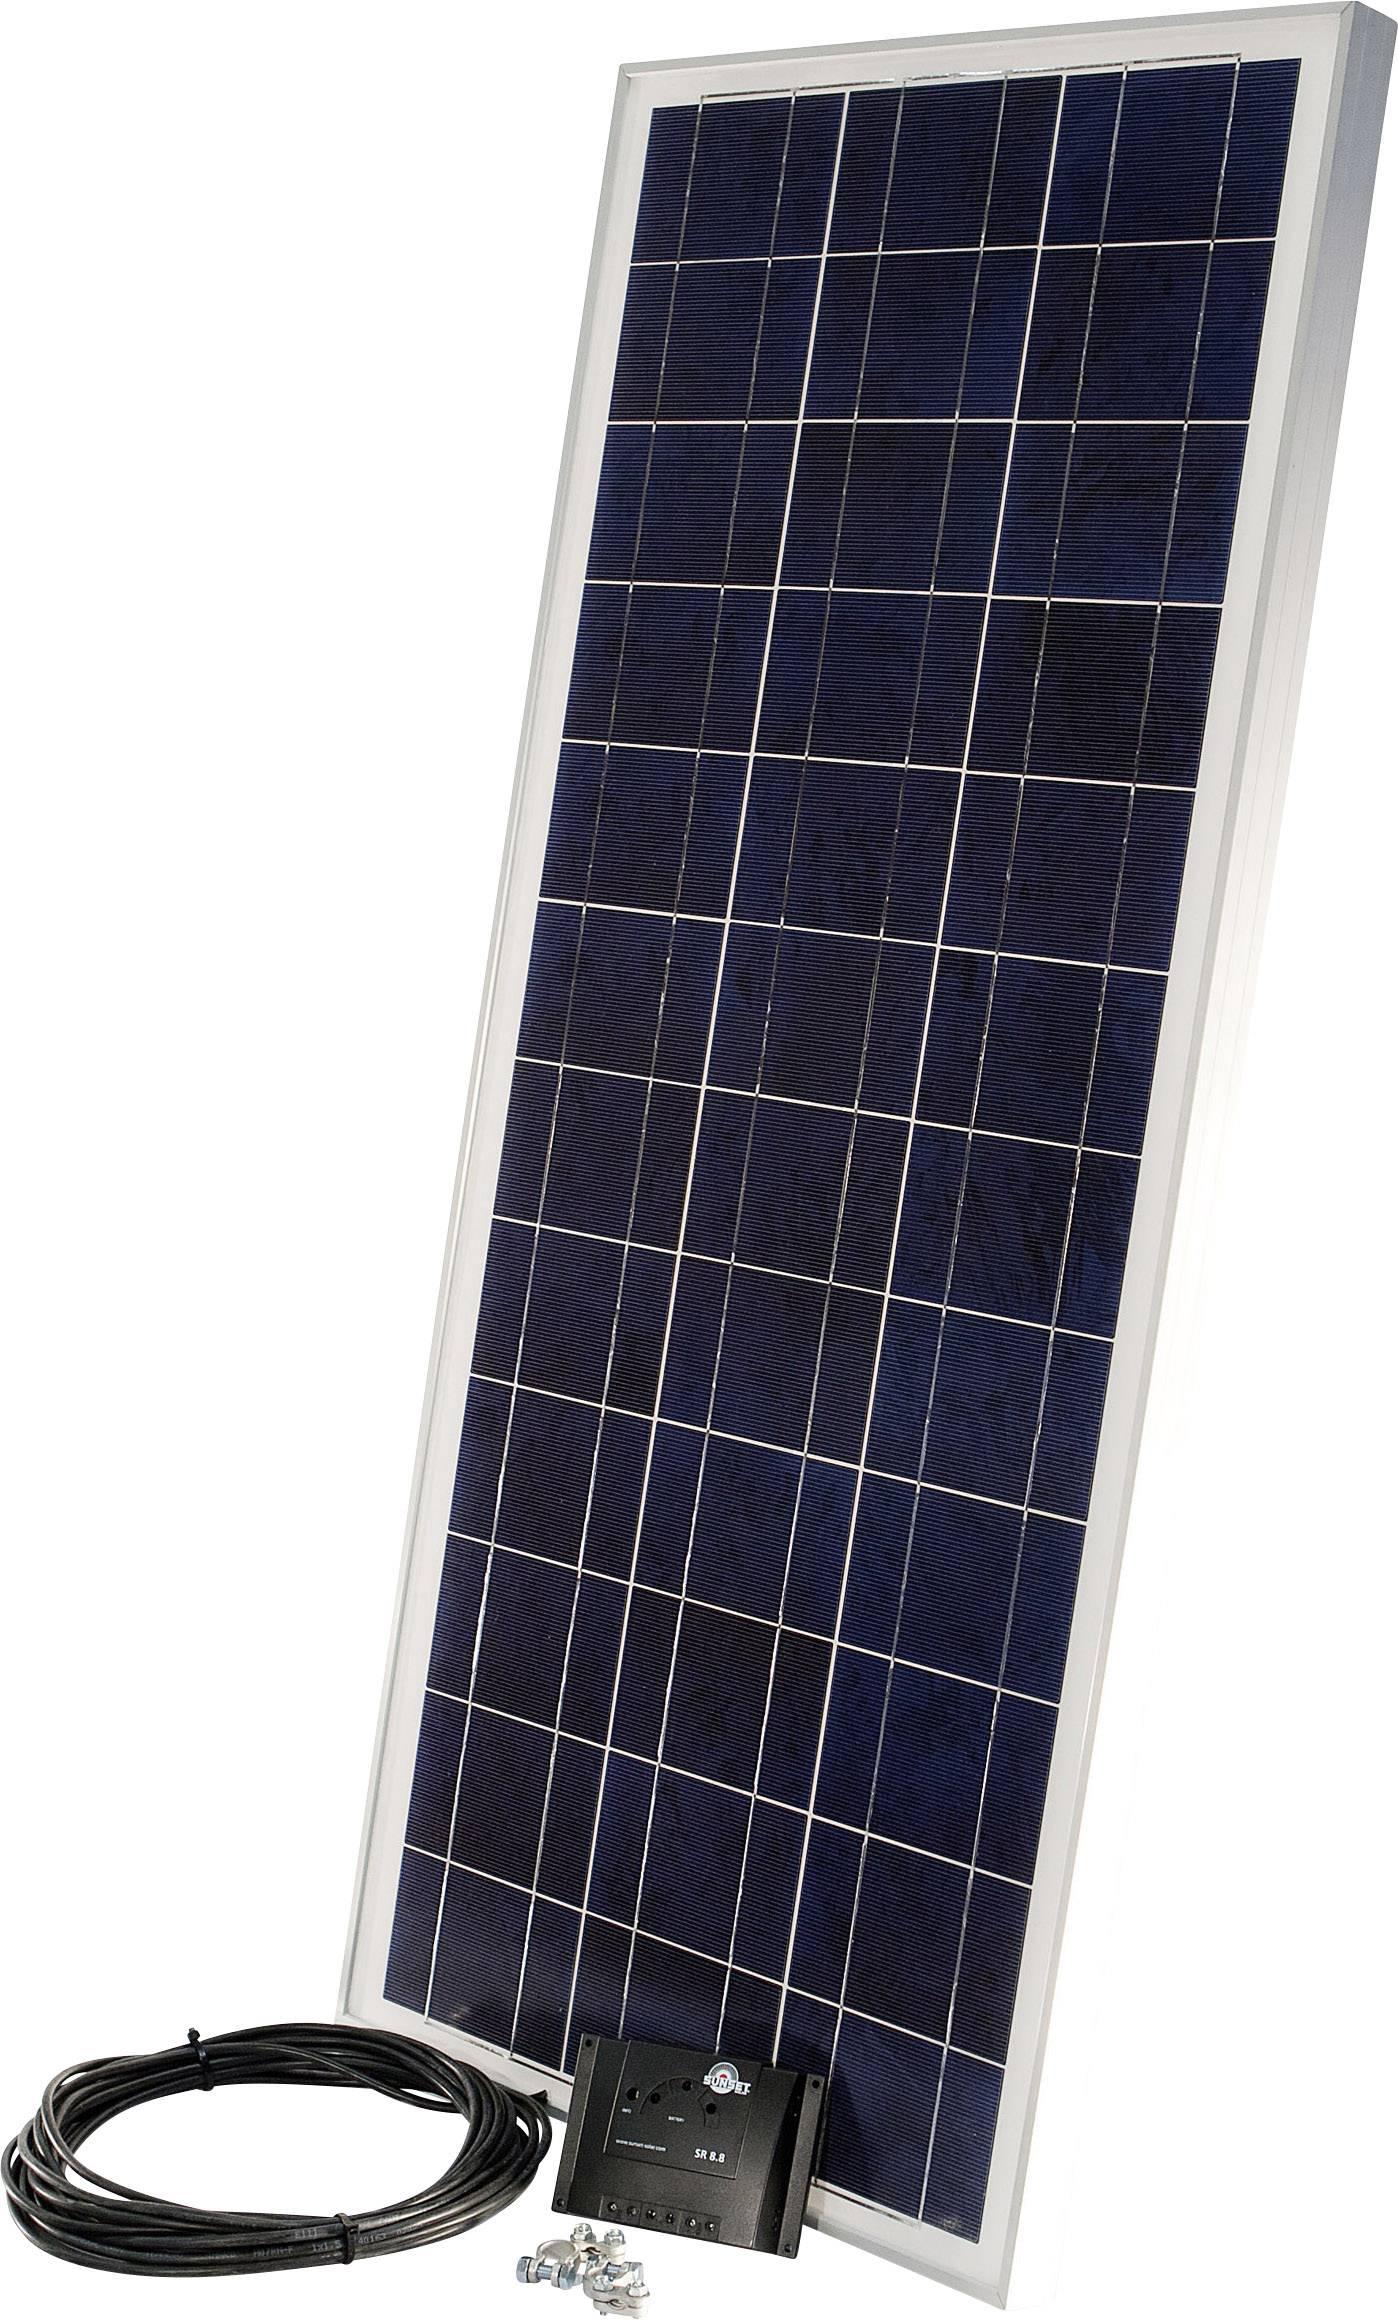 Solárna sada Sunset PX 85 110273, 85 Wp, vr. kábla, vr. nabíjacieho regulátora